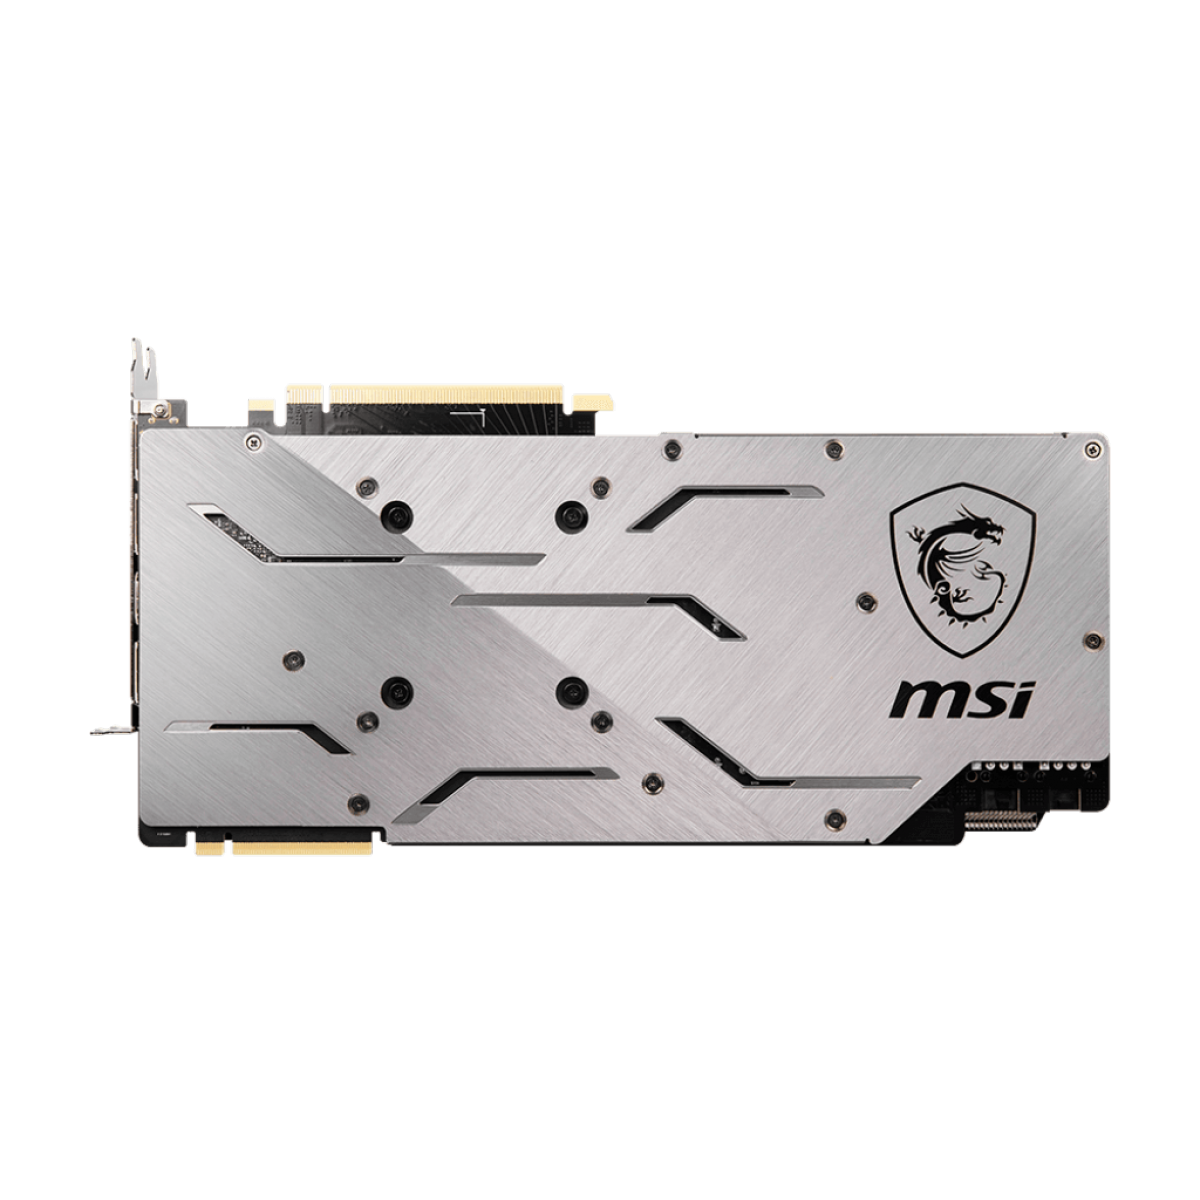 Placa de Vídeo MSI, GeForce, RTX 2070 Super Gaming X, RGB, 8GB, GDDR6, 256Bit, 912-V373-283